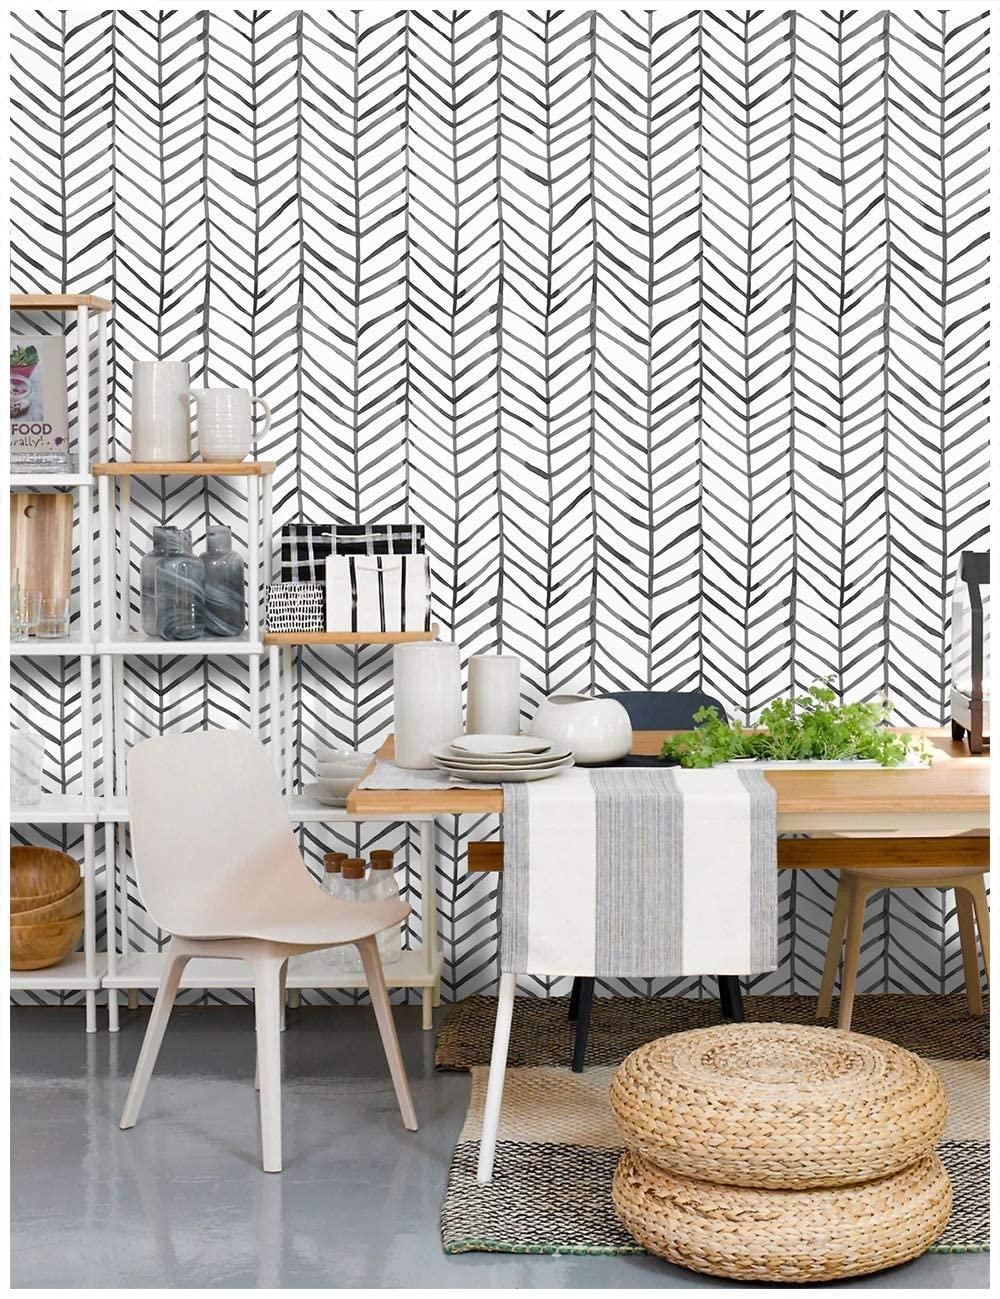 Wokhome Peel And Stick Wallpaper Modern Stripe Contact Paper Herringbone Black White Vinyl Self Adhesive Wall Papers Decorative Wallpapers Aliexpress